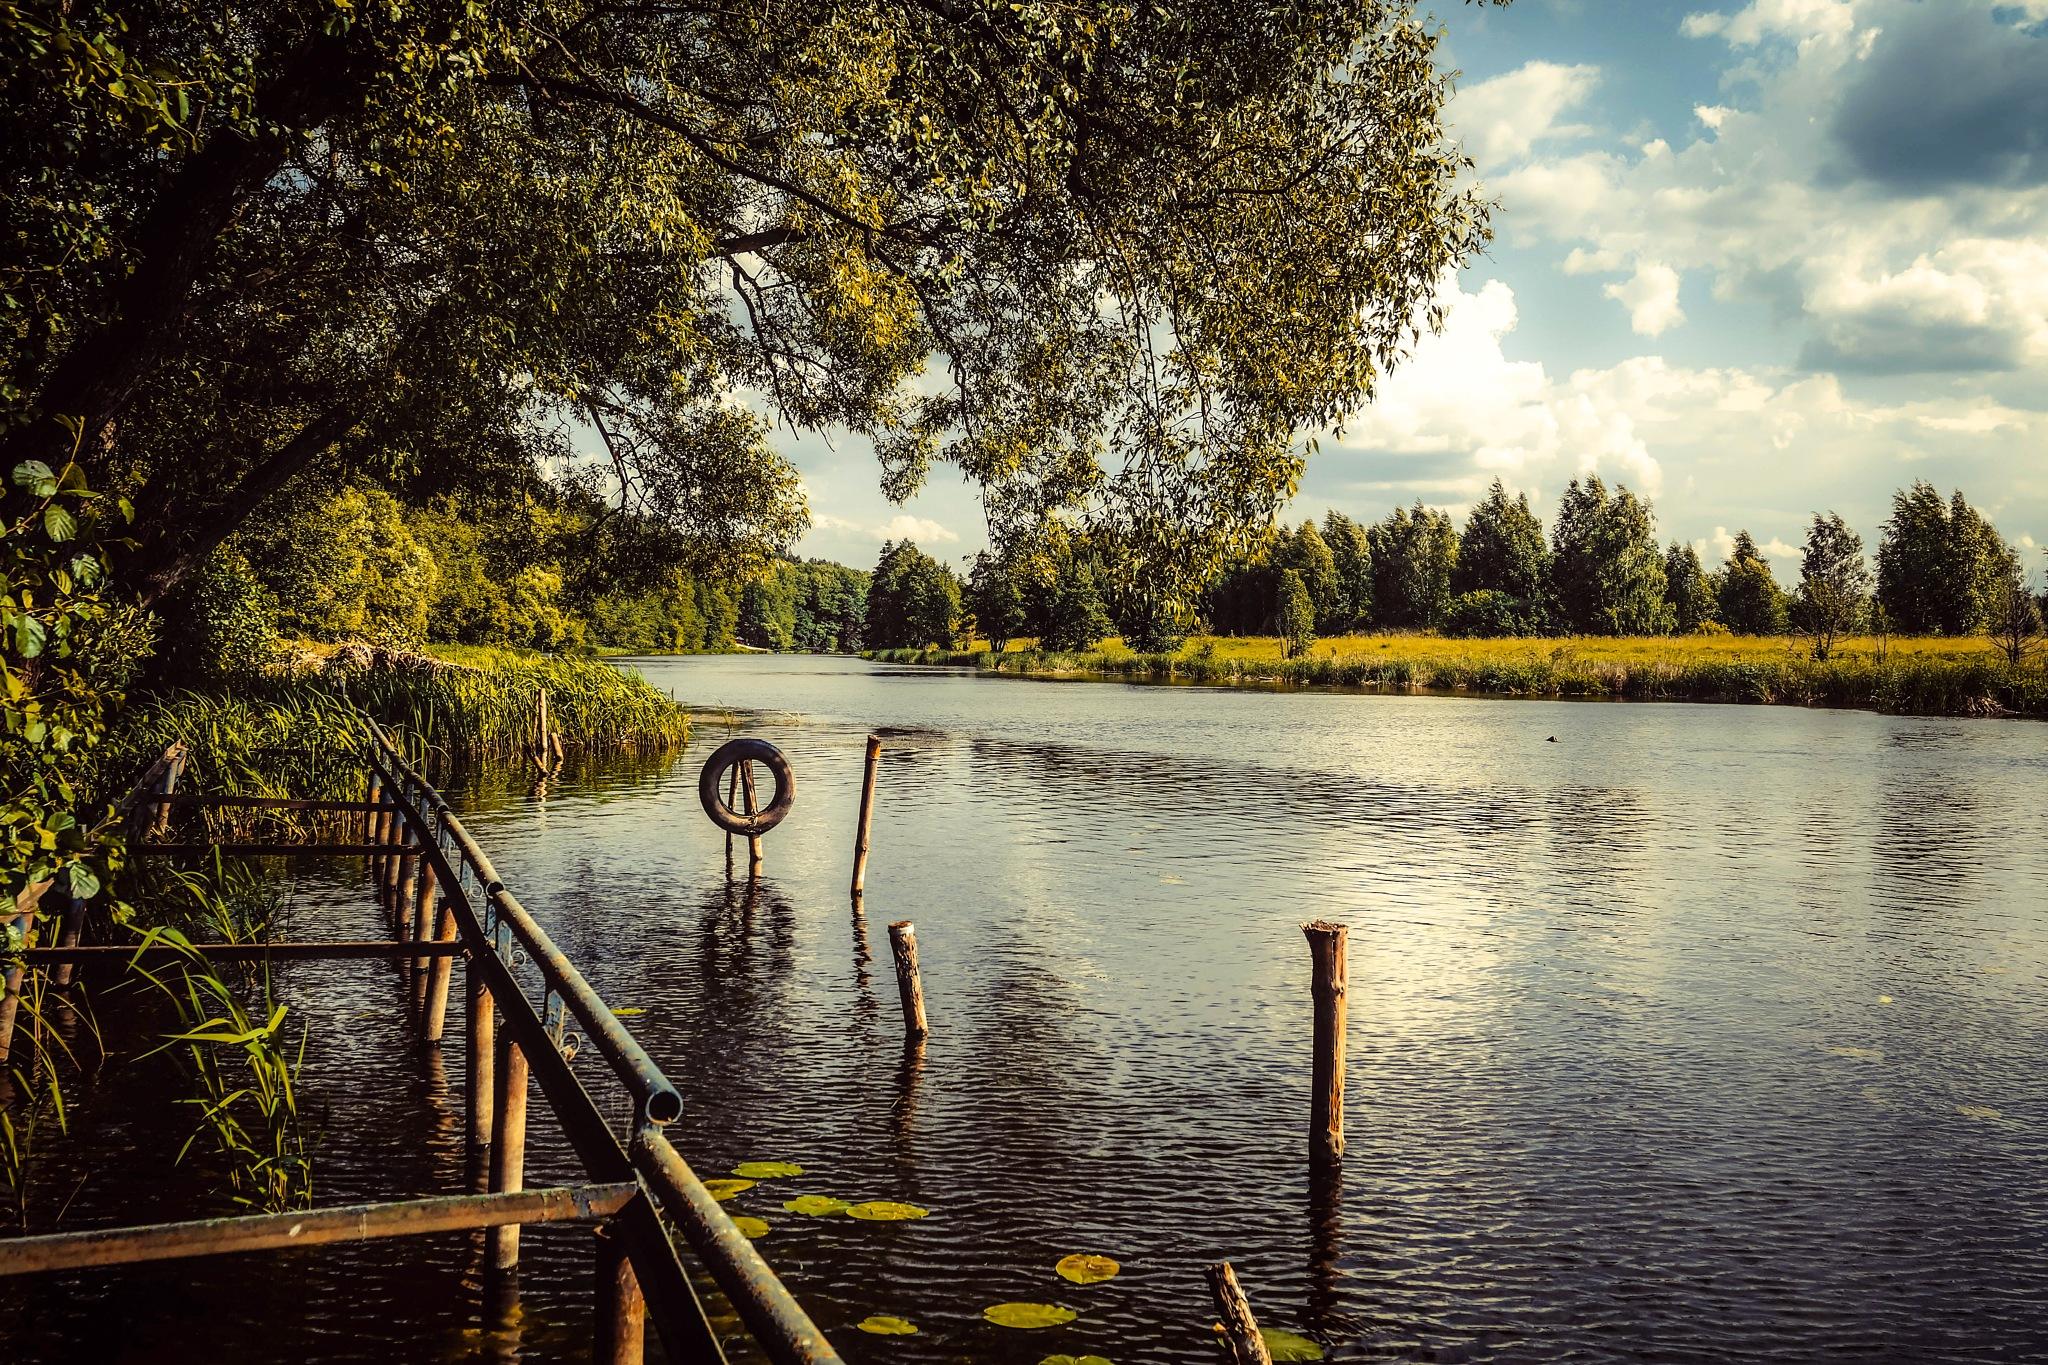 By the river............... by Alexandr  Seleznev